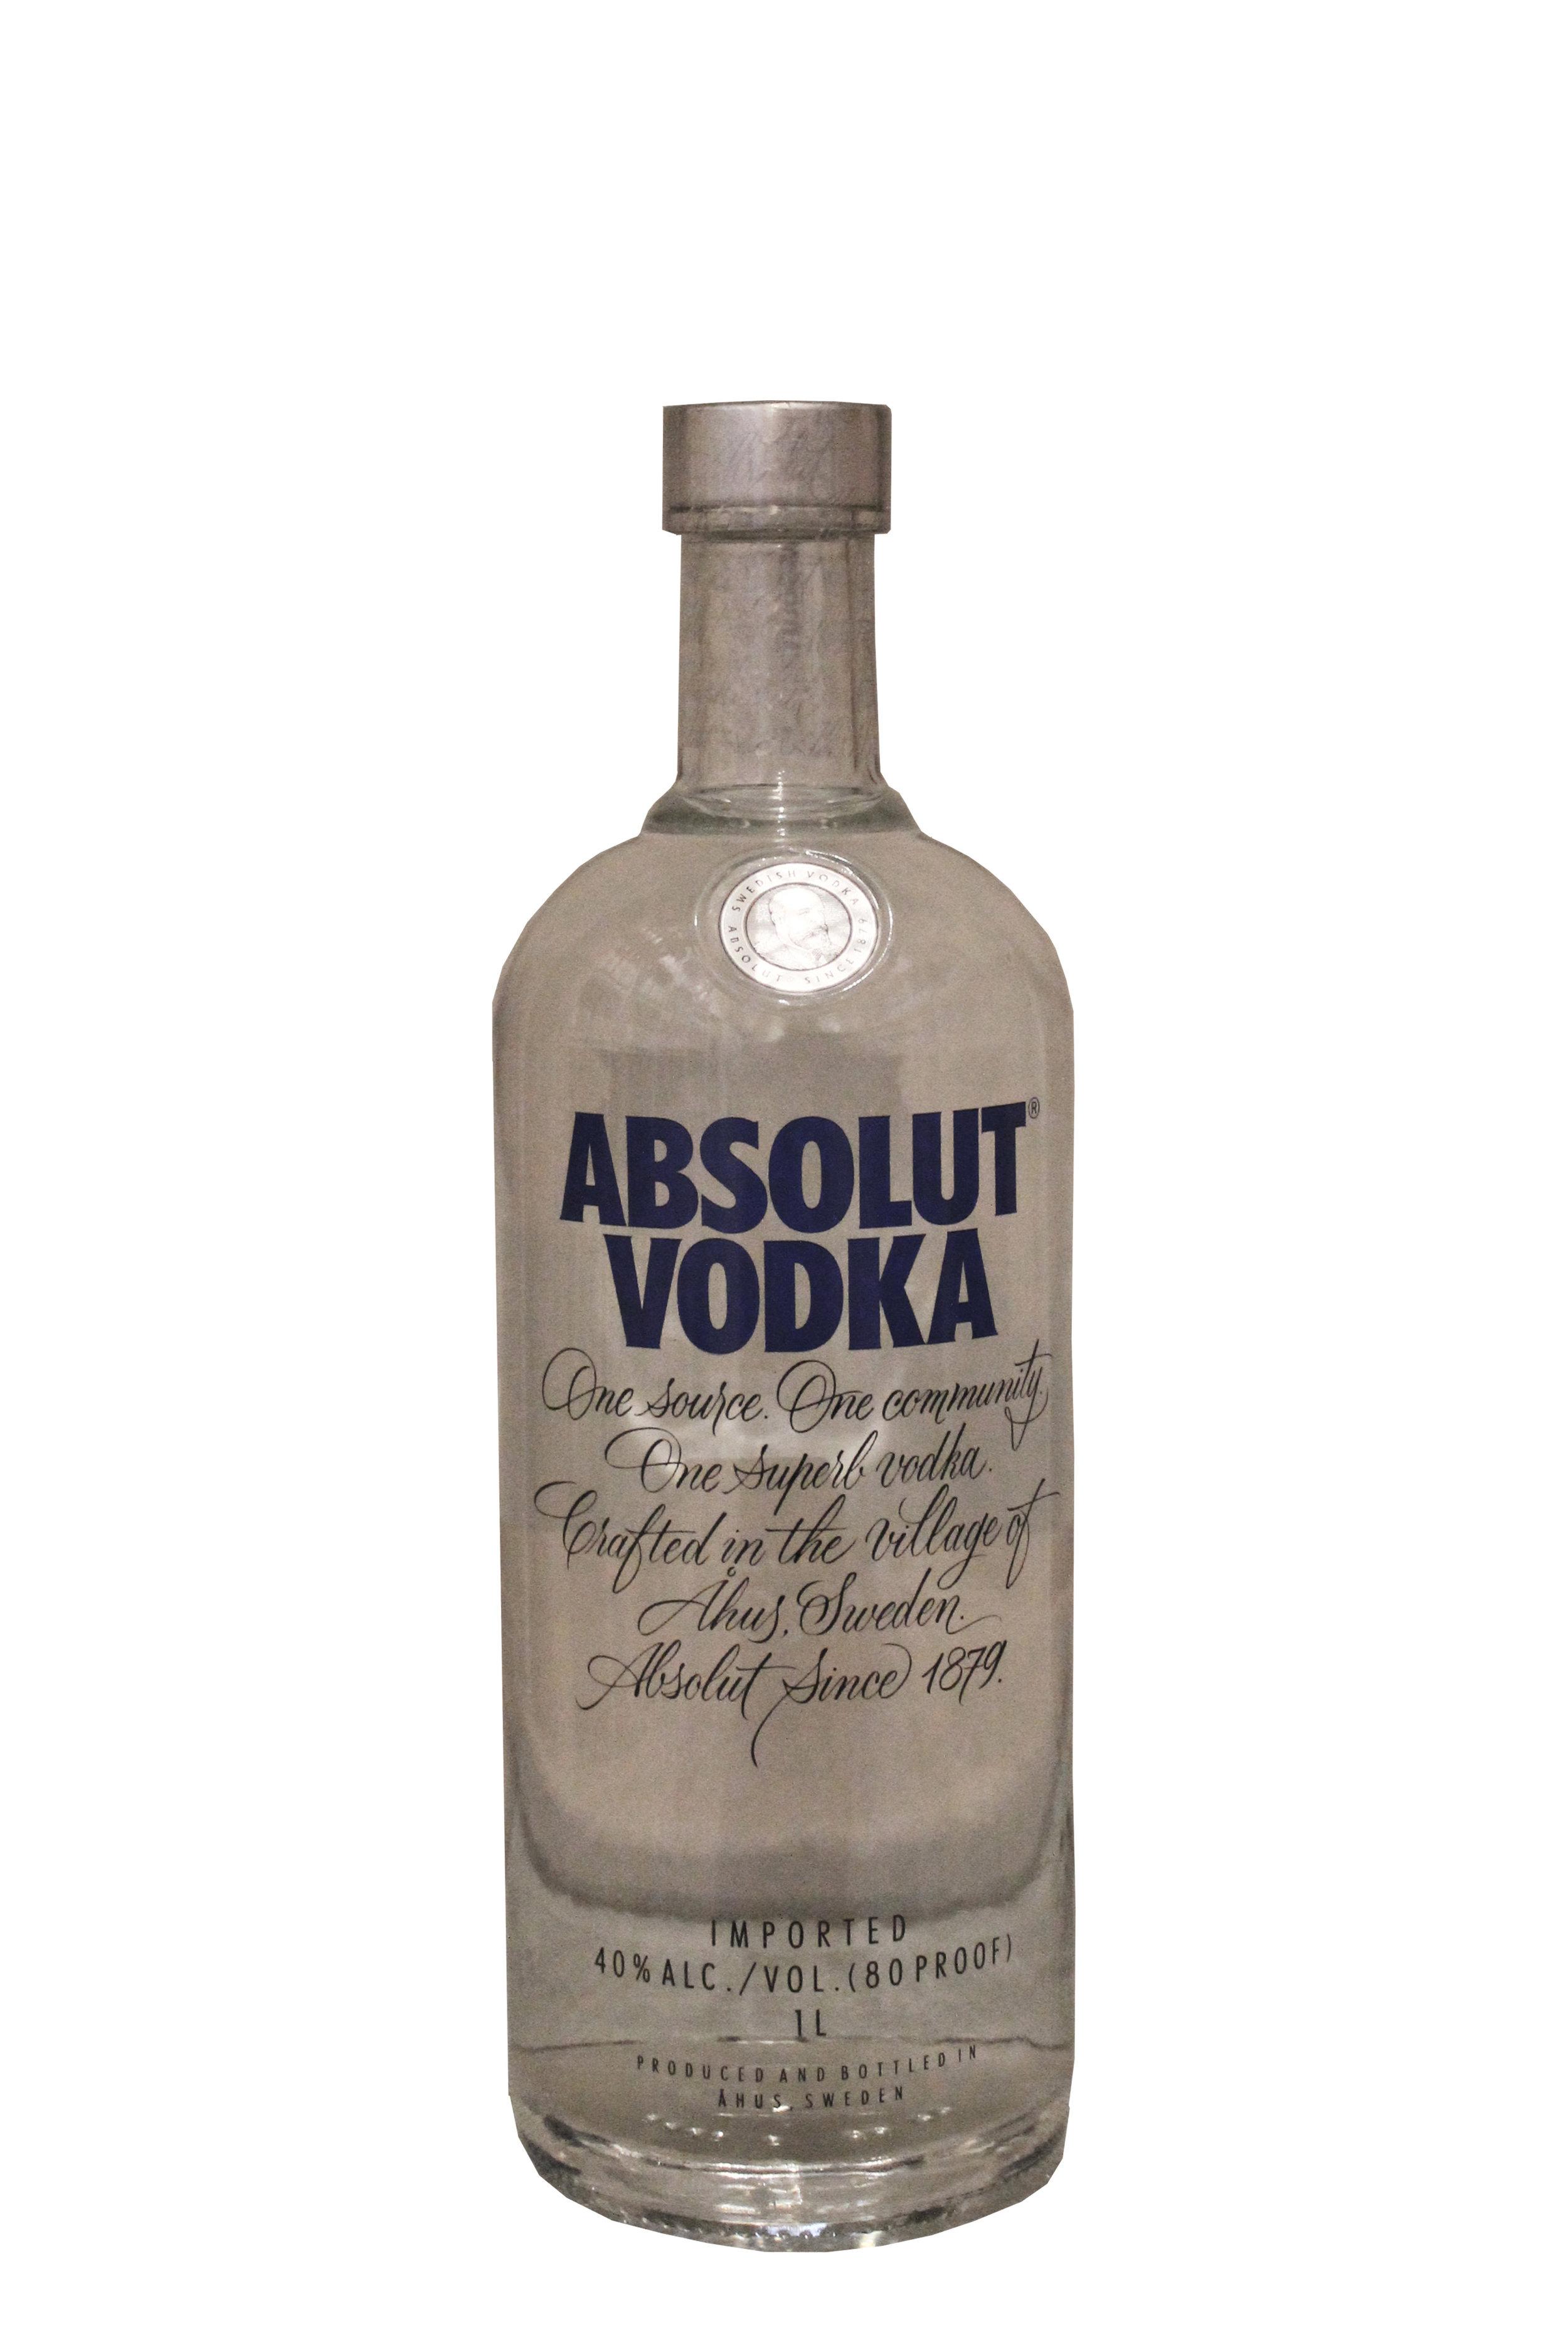 Premium Imported Vodka  Absolut, Sweden